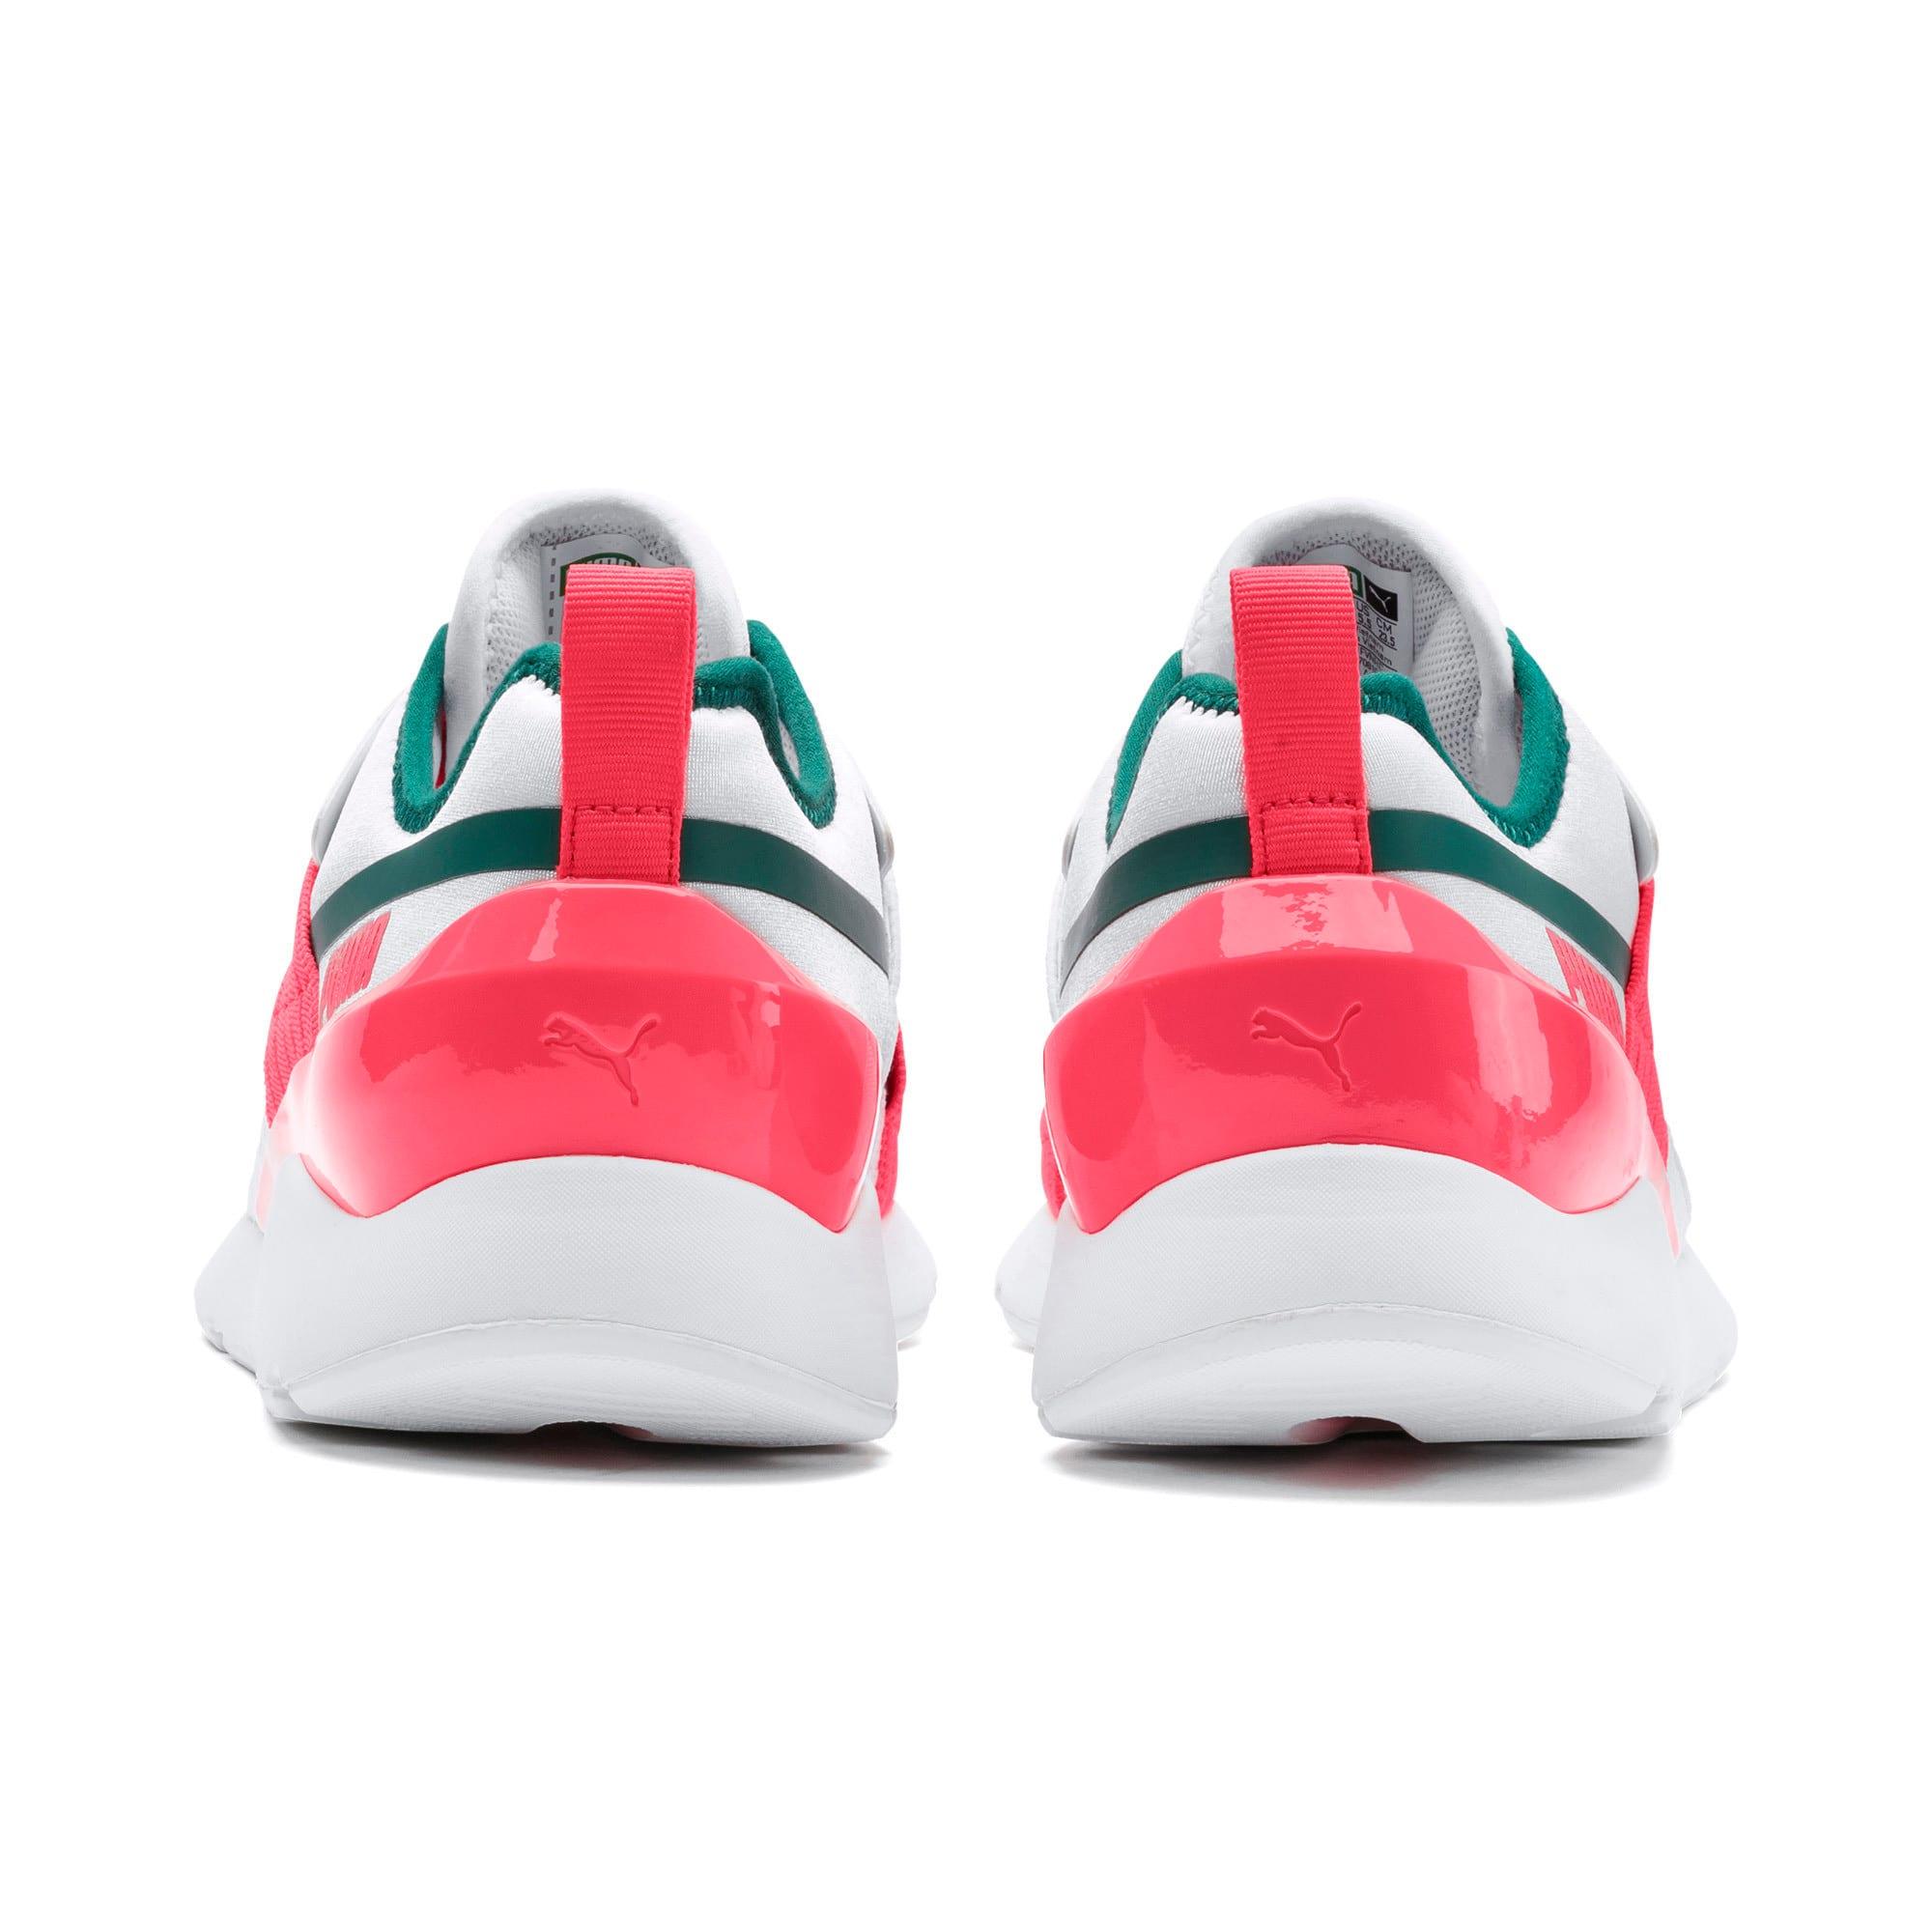 Thumbnail 4 of Muse X-2 Women's Sneakers, Puma White-Pink Alert, medium